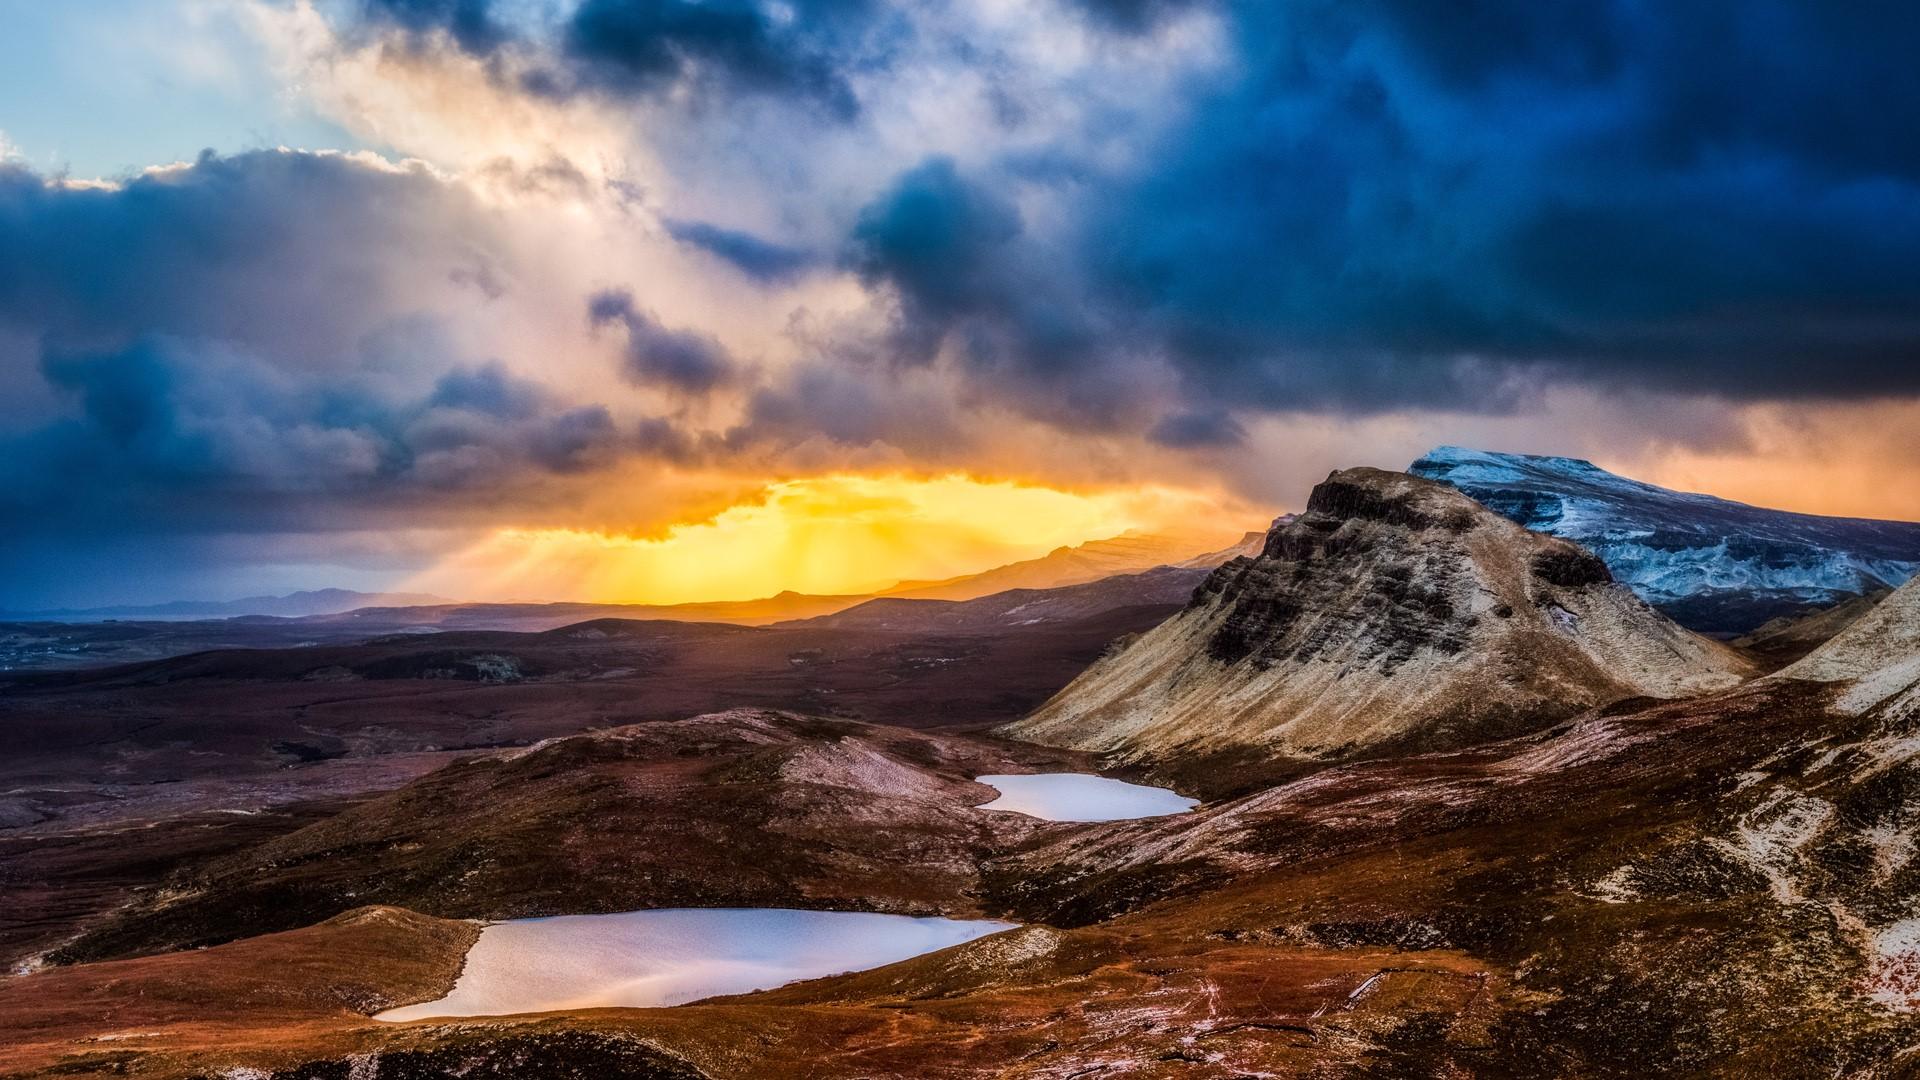 General 1920x1080 nature landscape clouds sunlight pond mountains sky rocks grass field Skye Scotland UK sunset